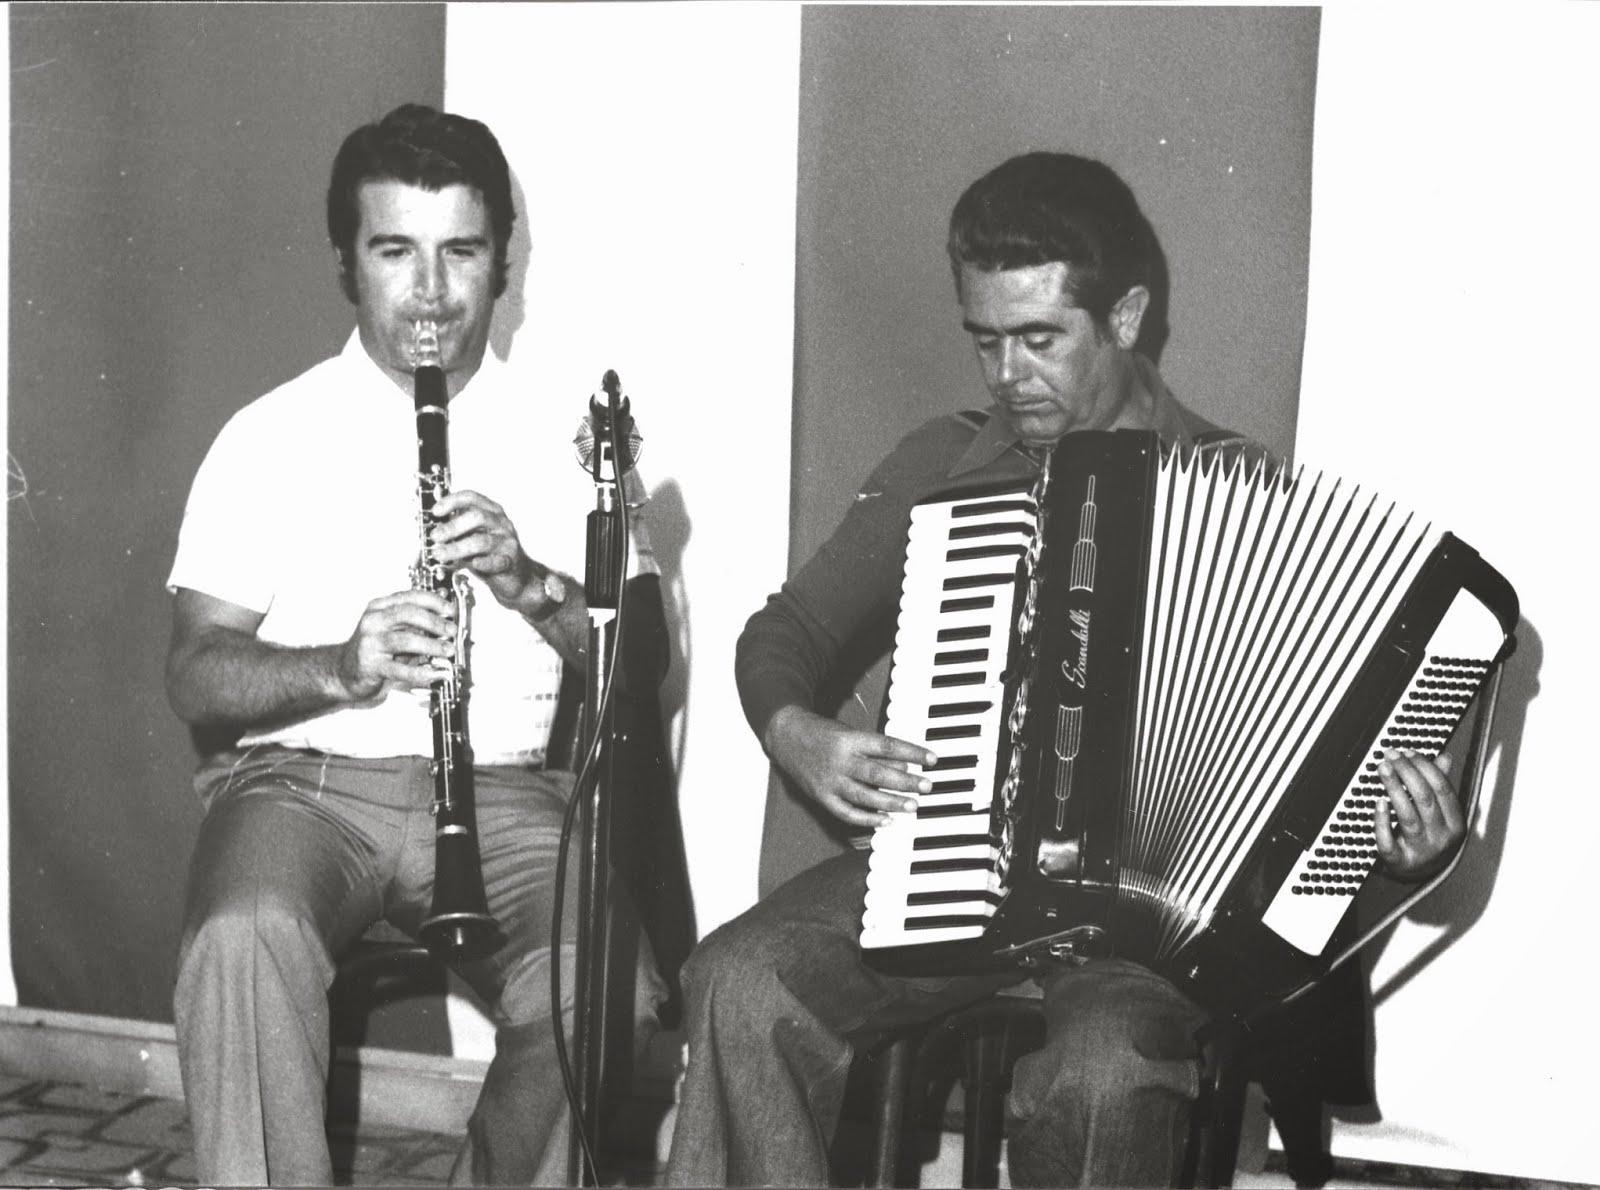 LA MUSICA A SAN MARCO IN LAMIS